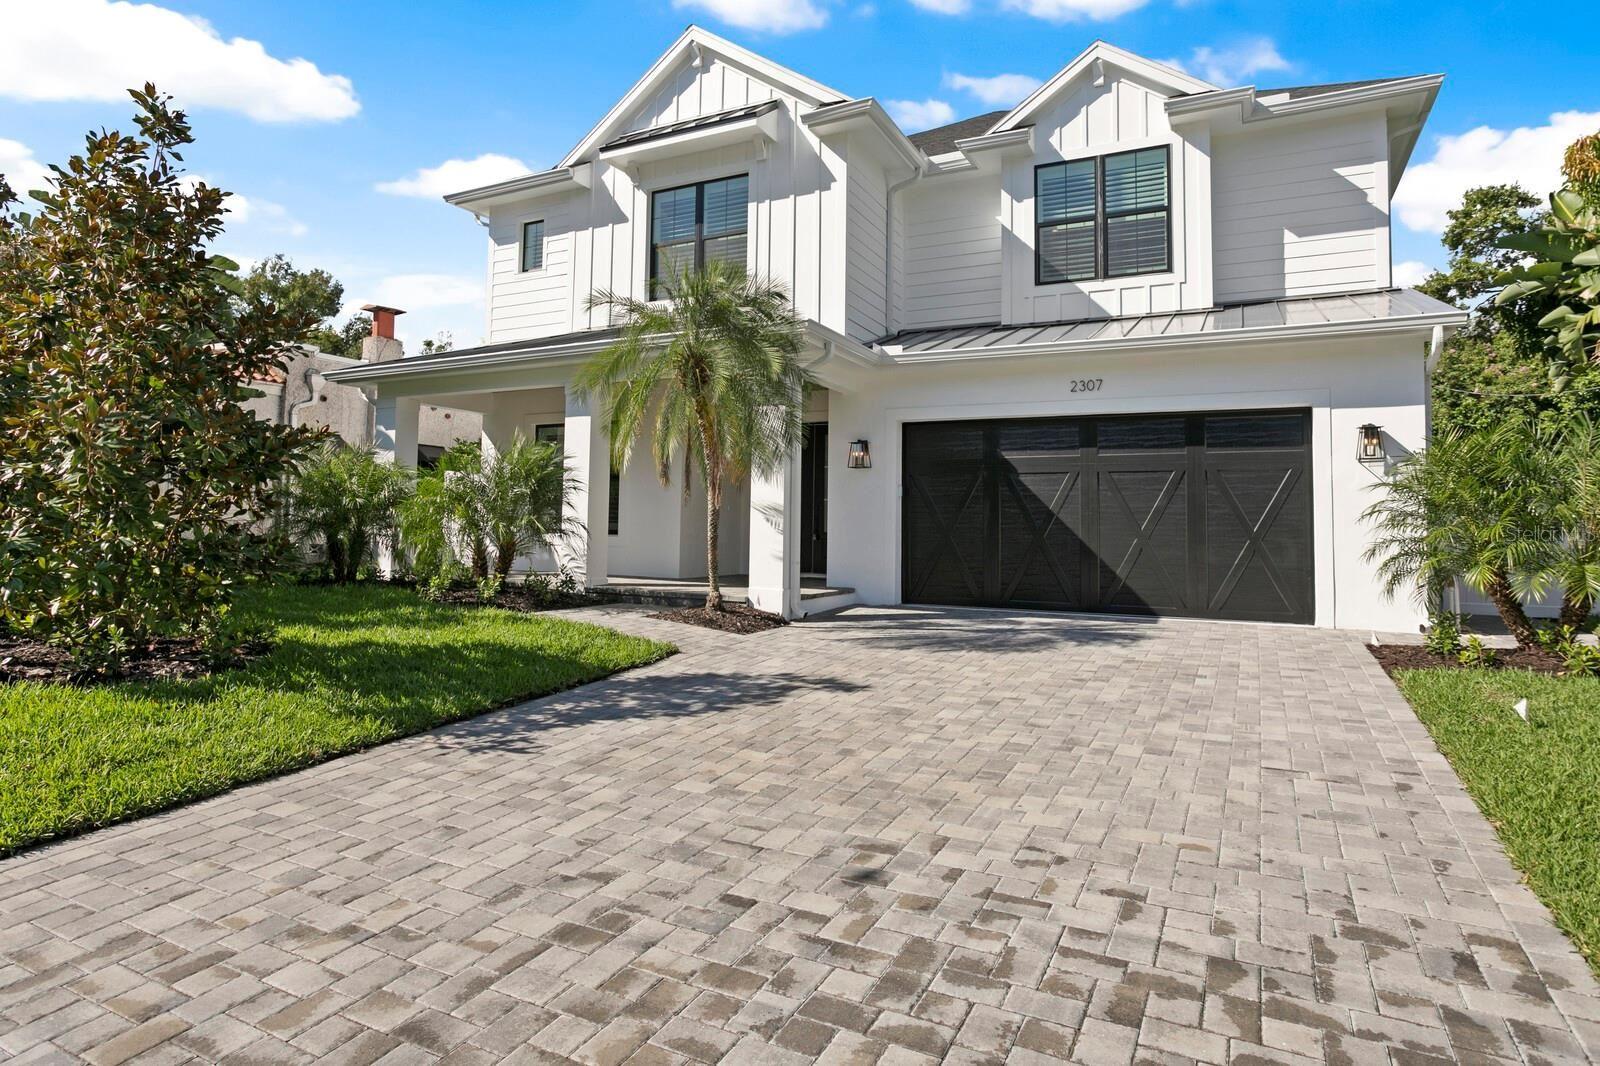 3302 W LAWN AVENUE, Tampa, FL 33611 - #: T3319431